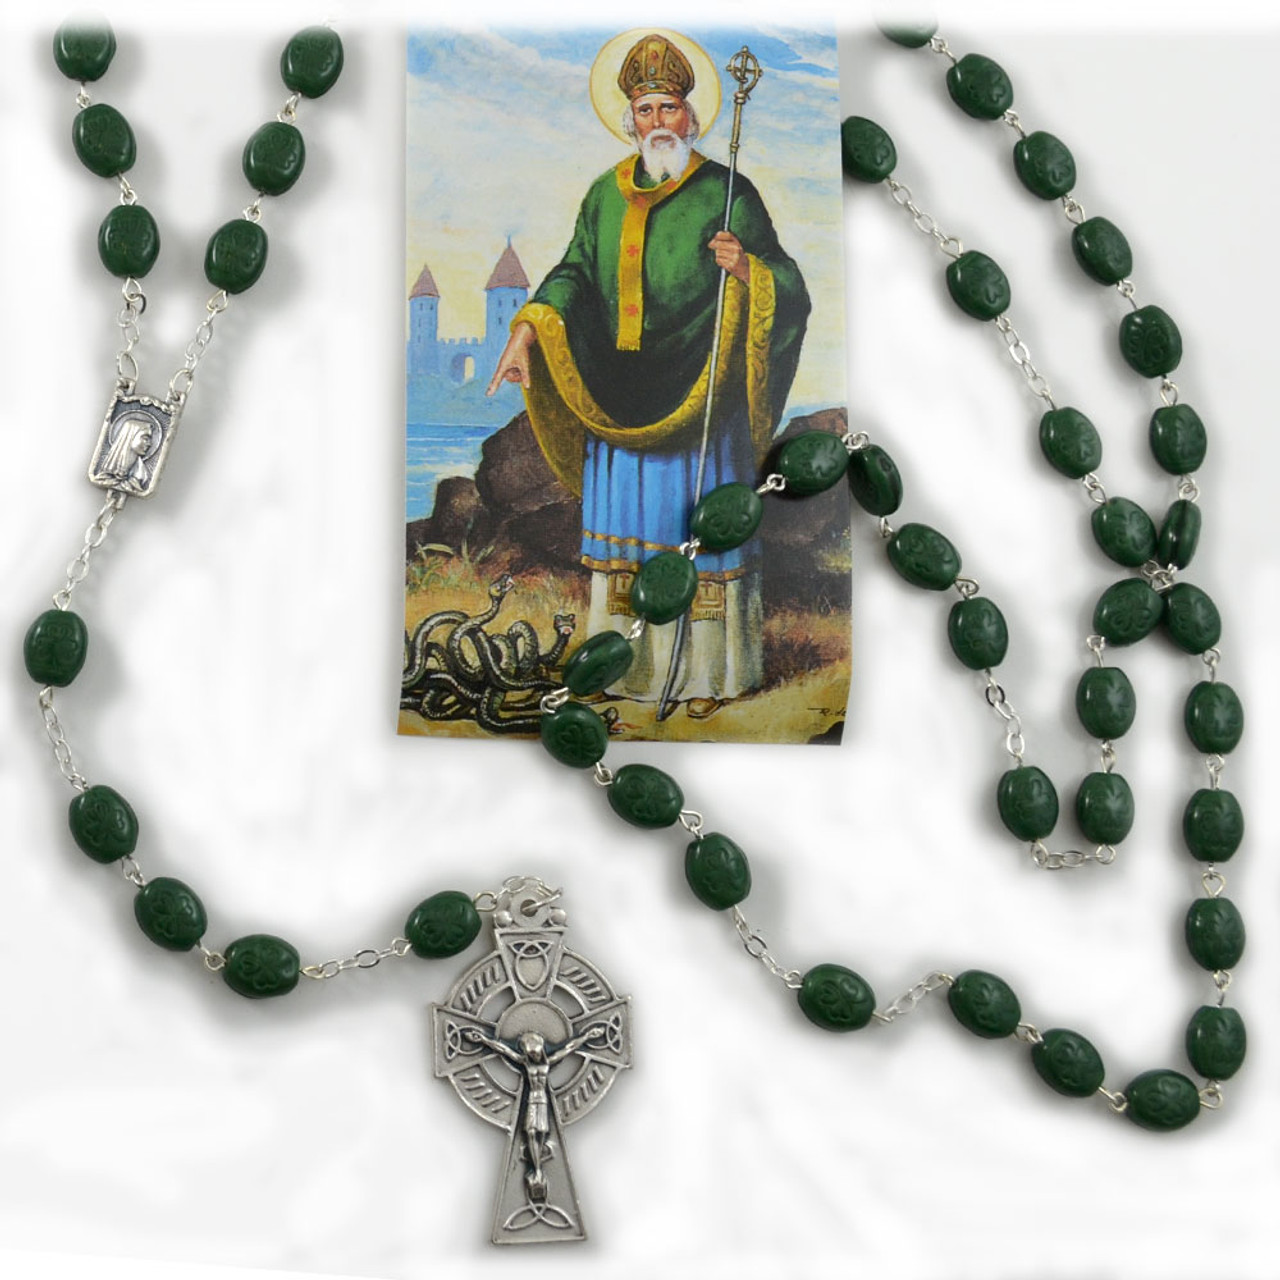 Irish Rosary with Shamrock Beads and Celtic Cross